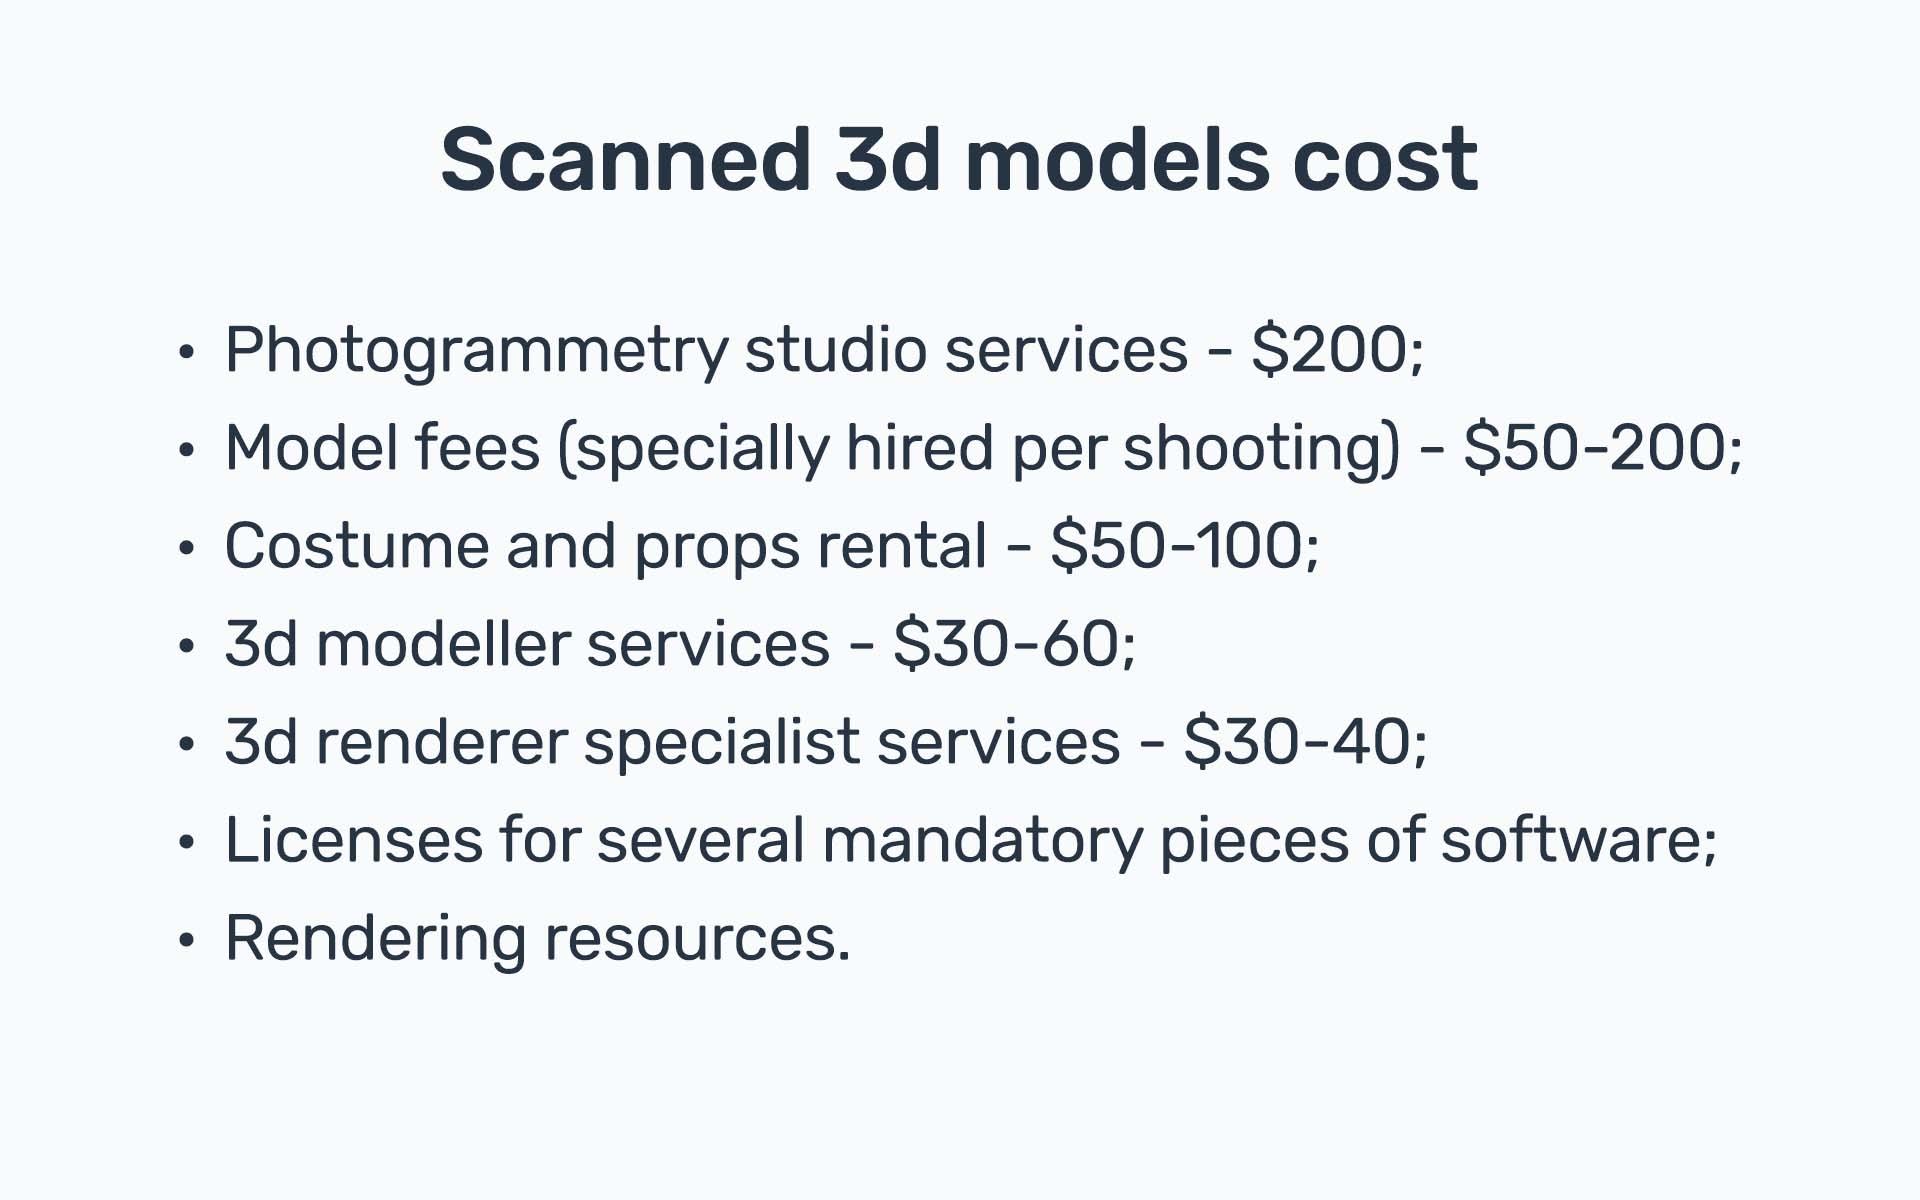 Scanned 3d model cost